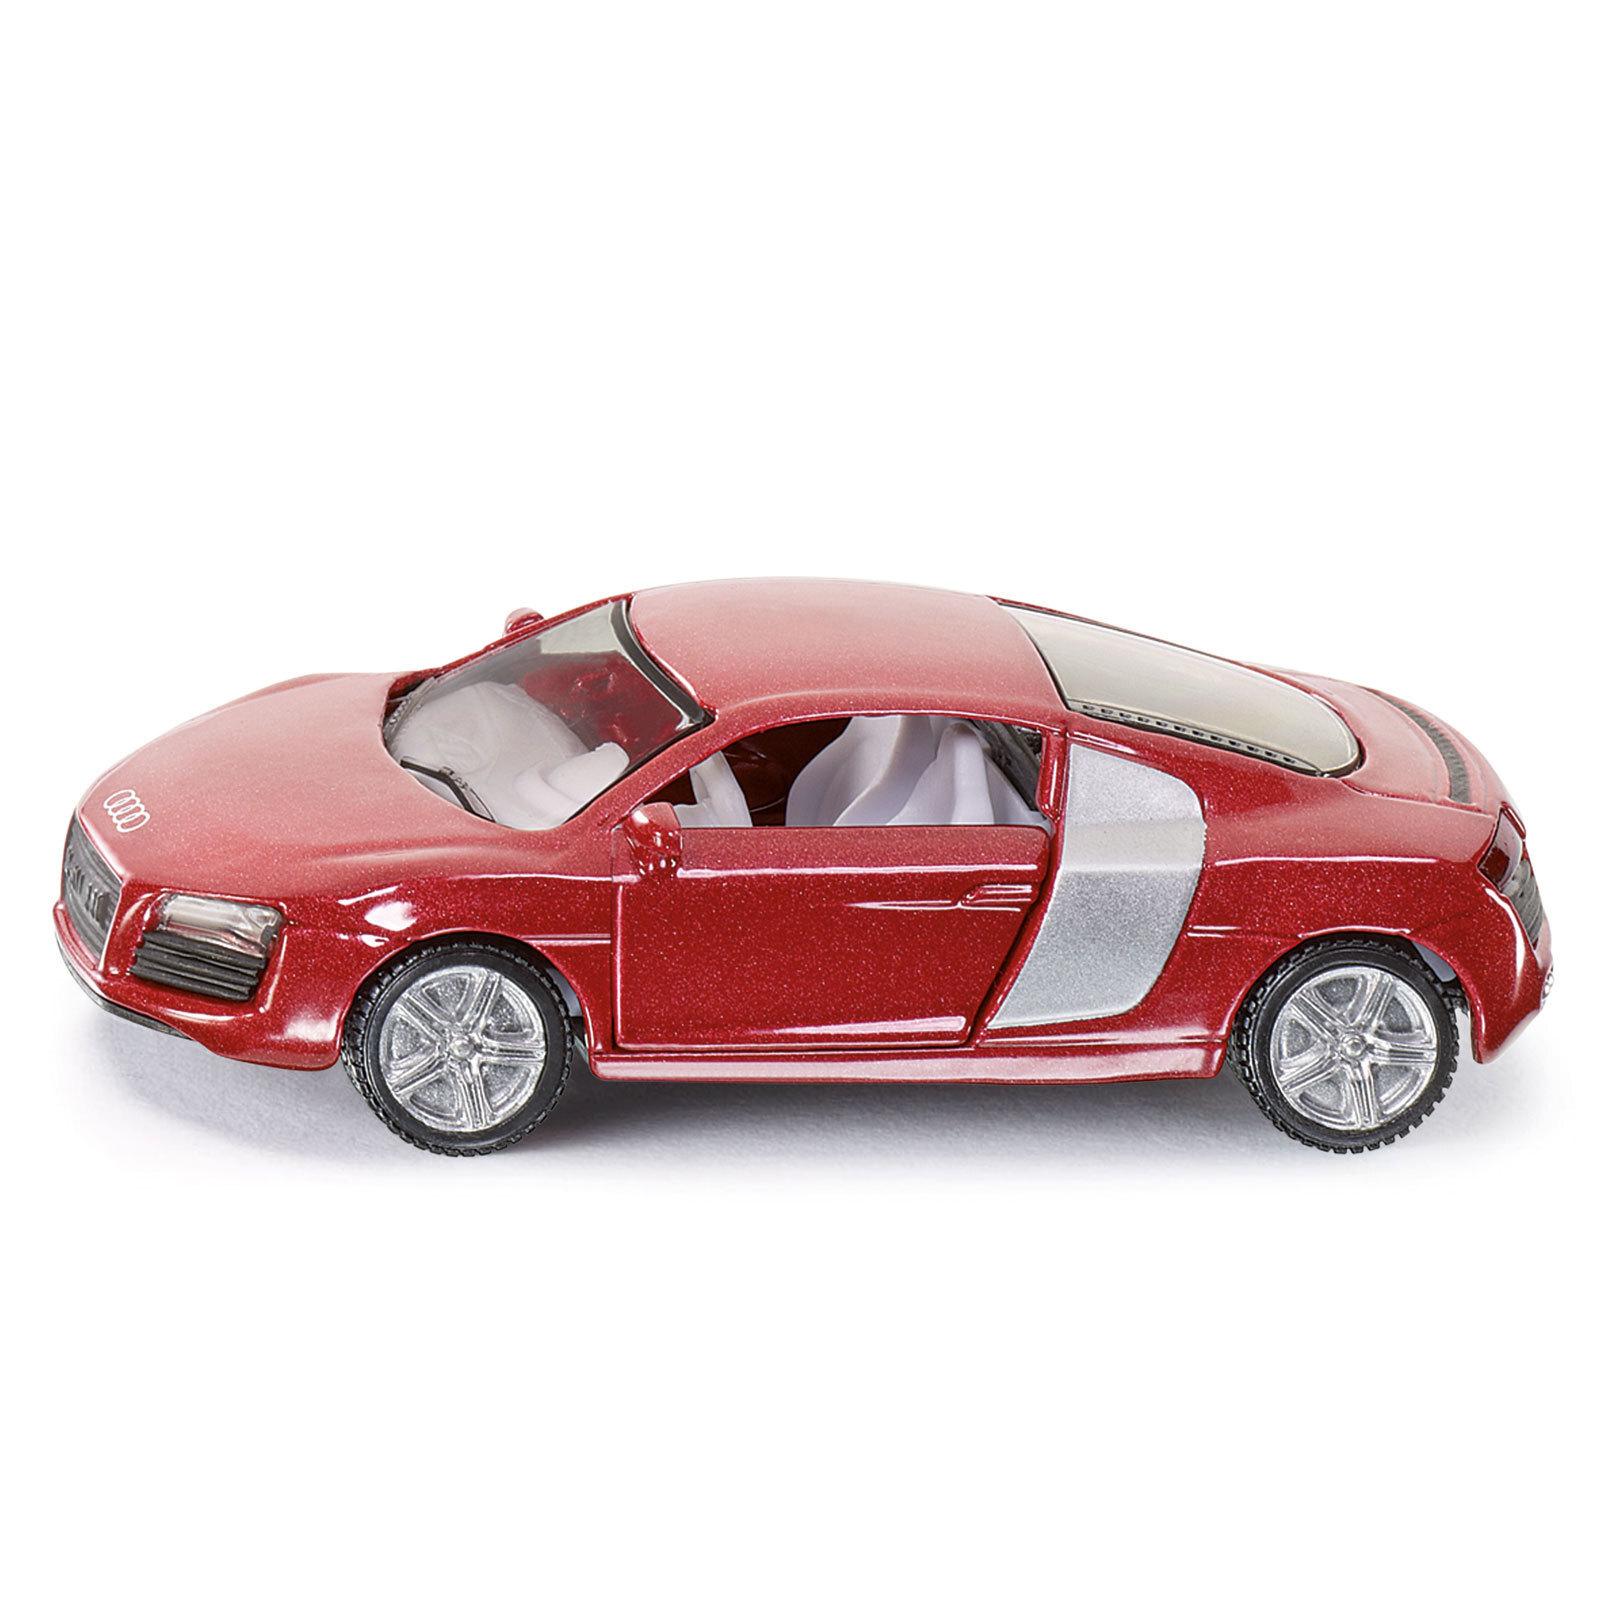 siku spielzeug modell audi r8 rennwagen pkw auto. Black Bedroom Furniture Sets. Home Design Ideas